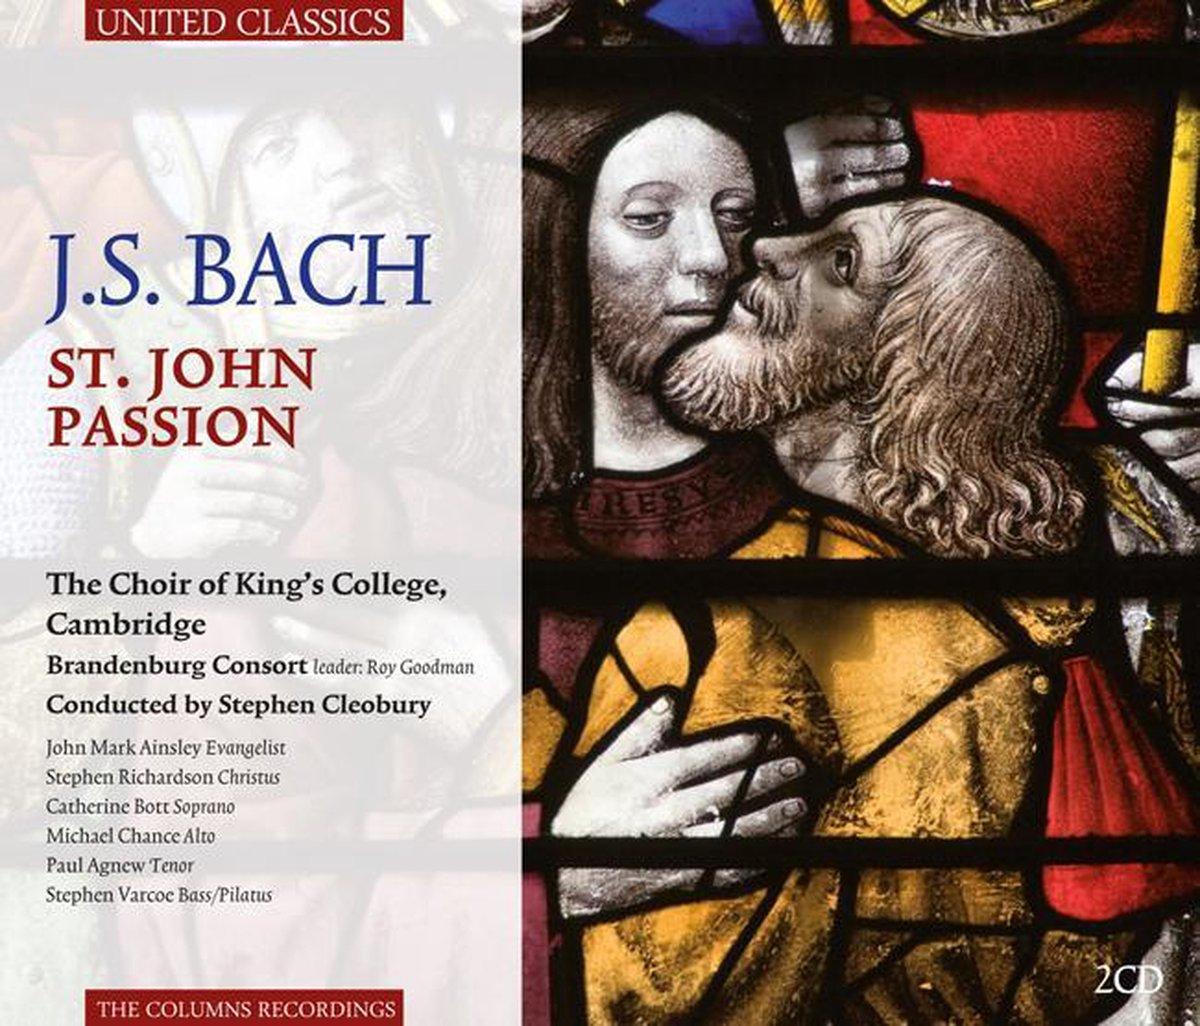 St. John Passion (J.S. Bach)